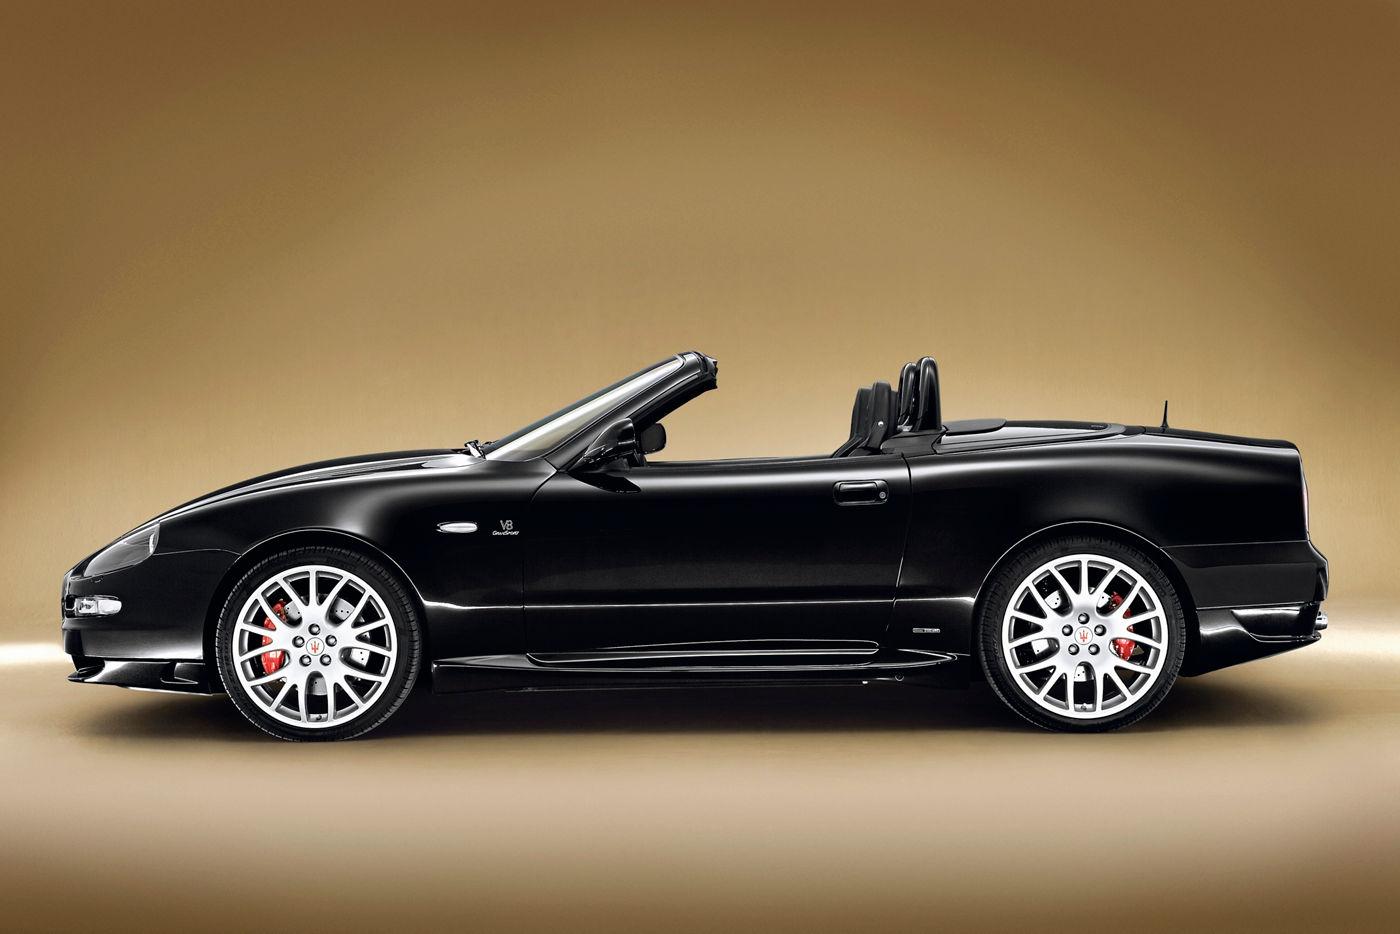 Maserati Classic - GranTurismo Spyder 3500GTI -carrosserie noire - vue latérale